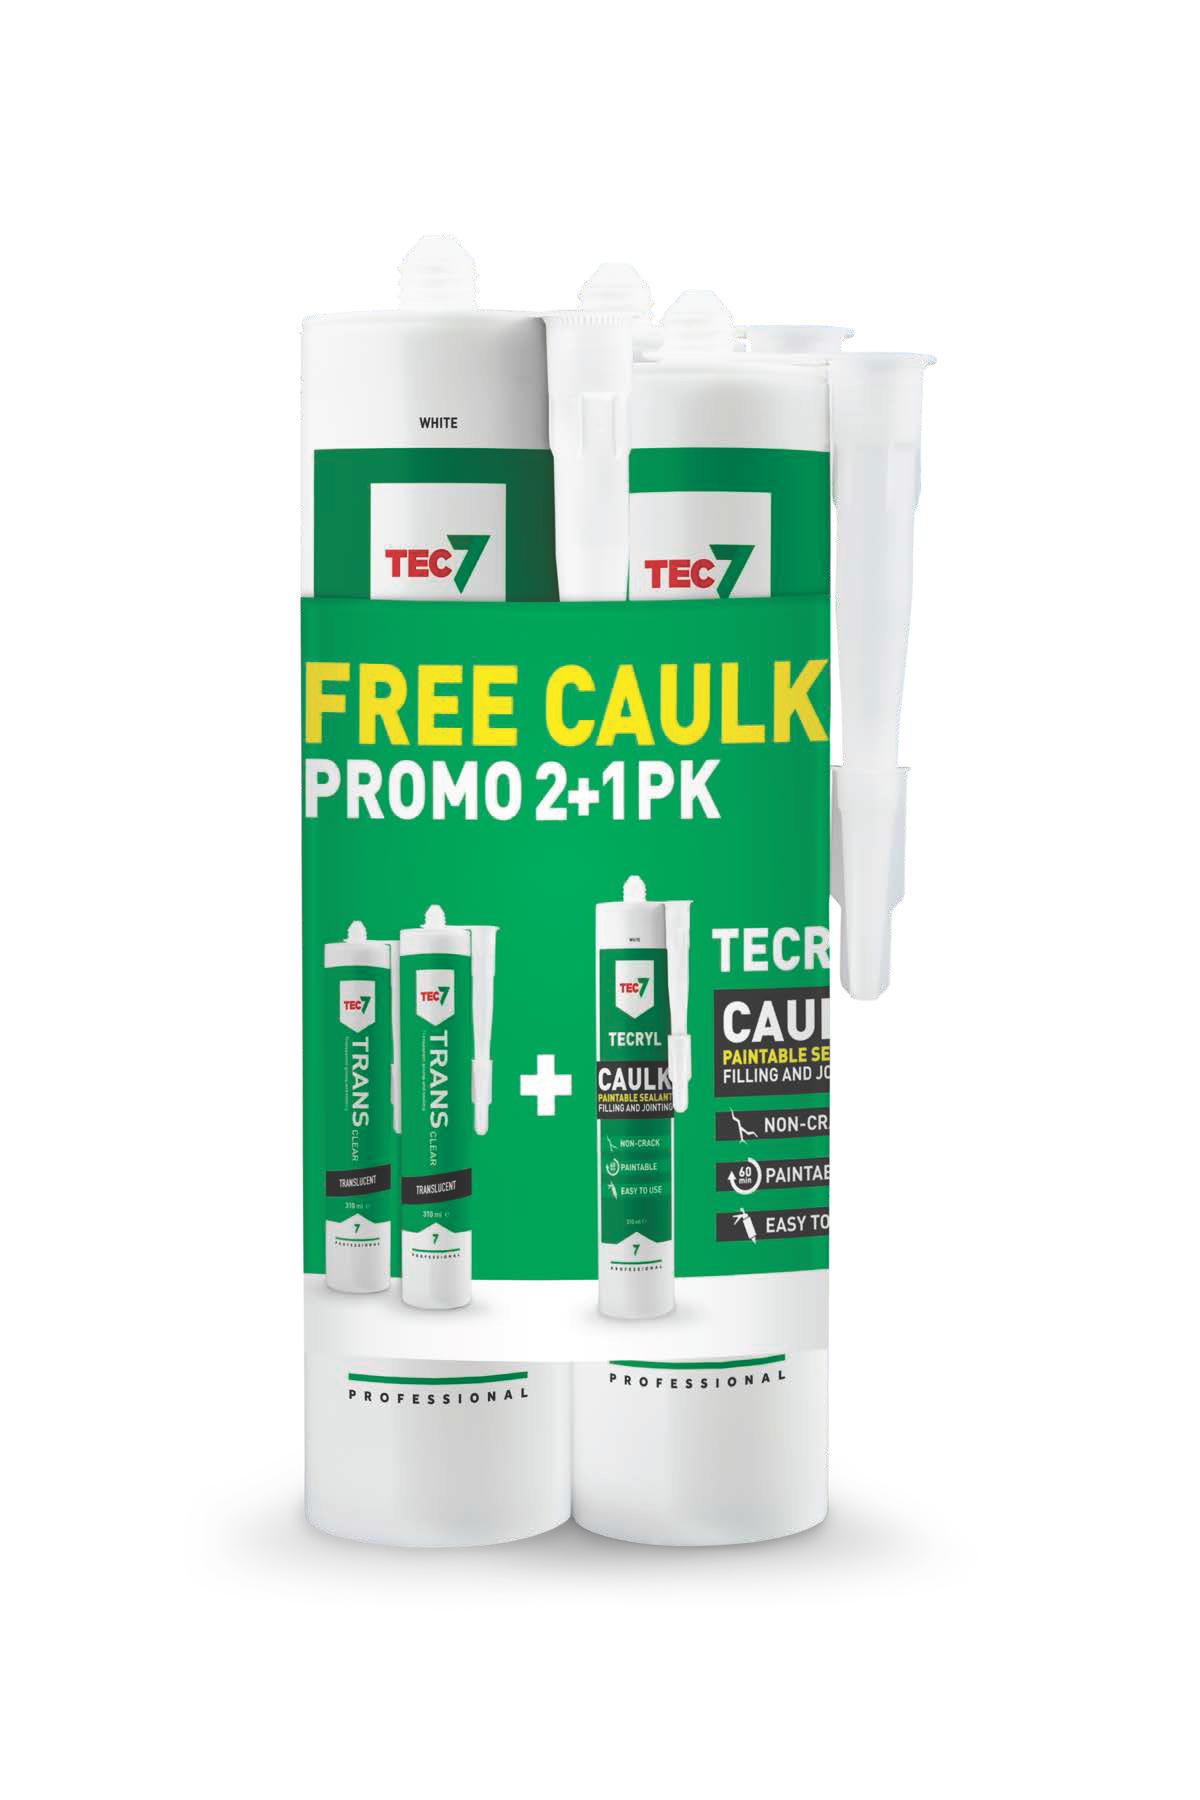 Tec7 Trans Clear & New Caulk Promo Pack